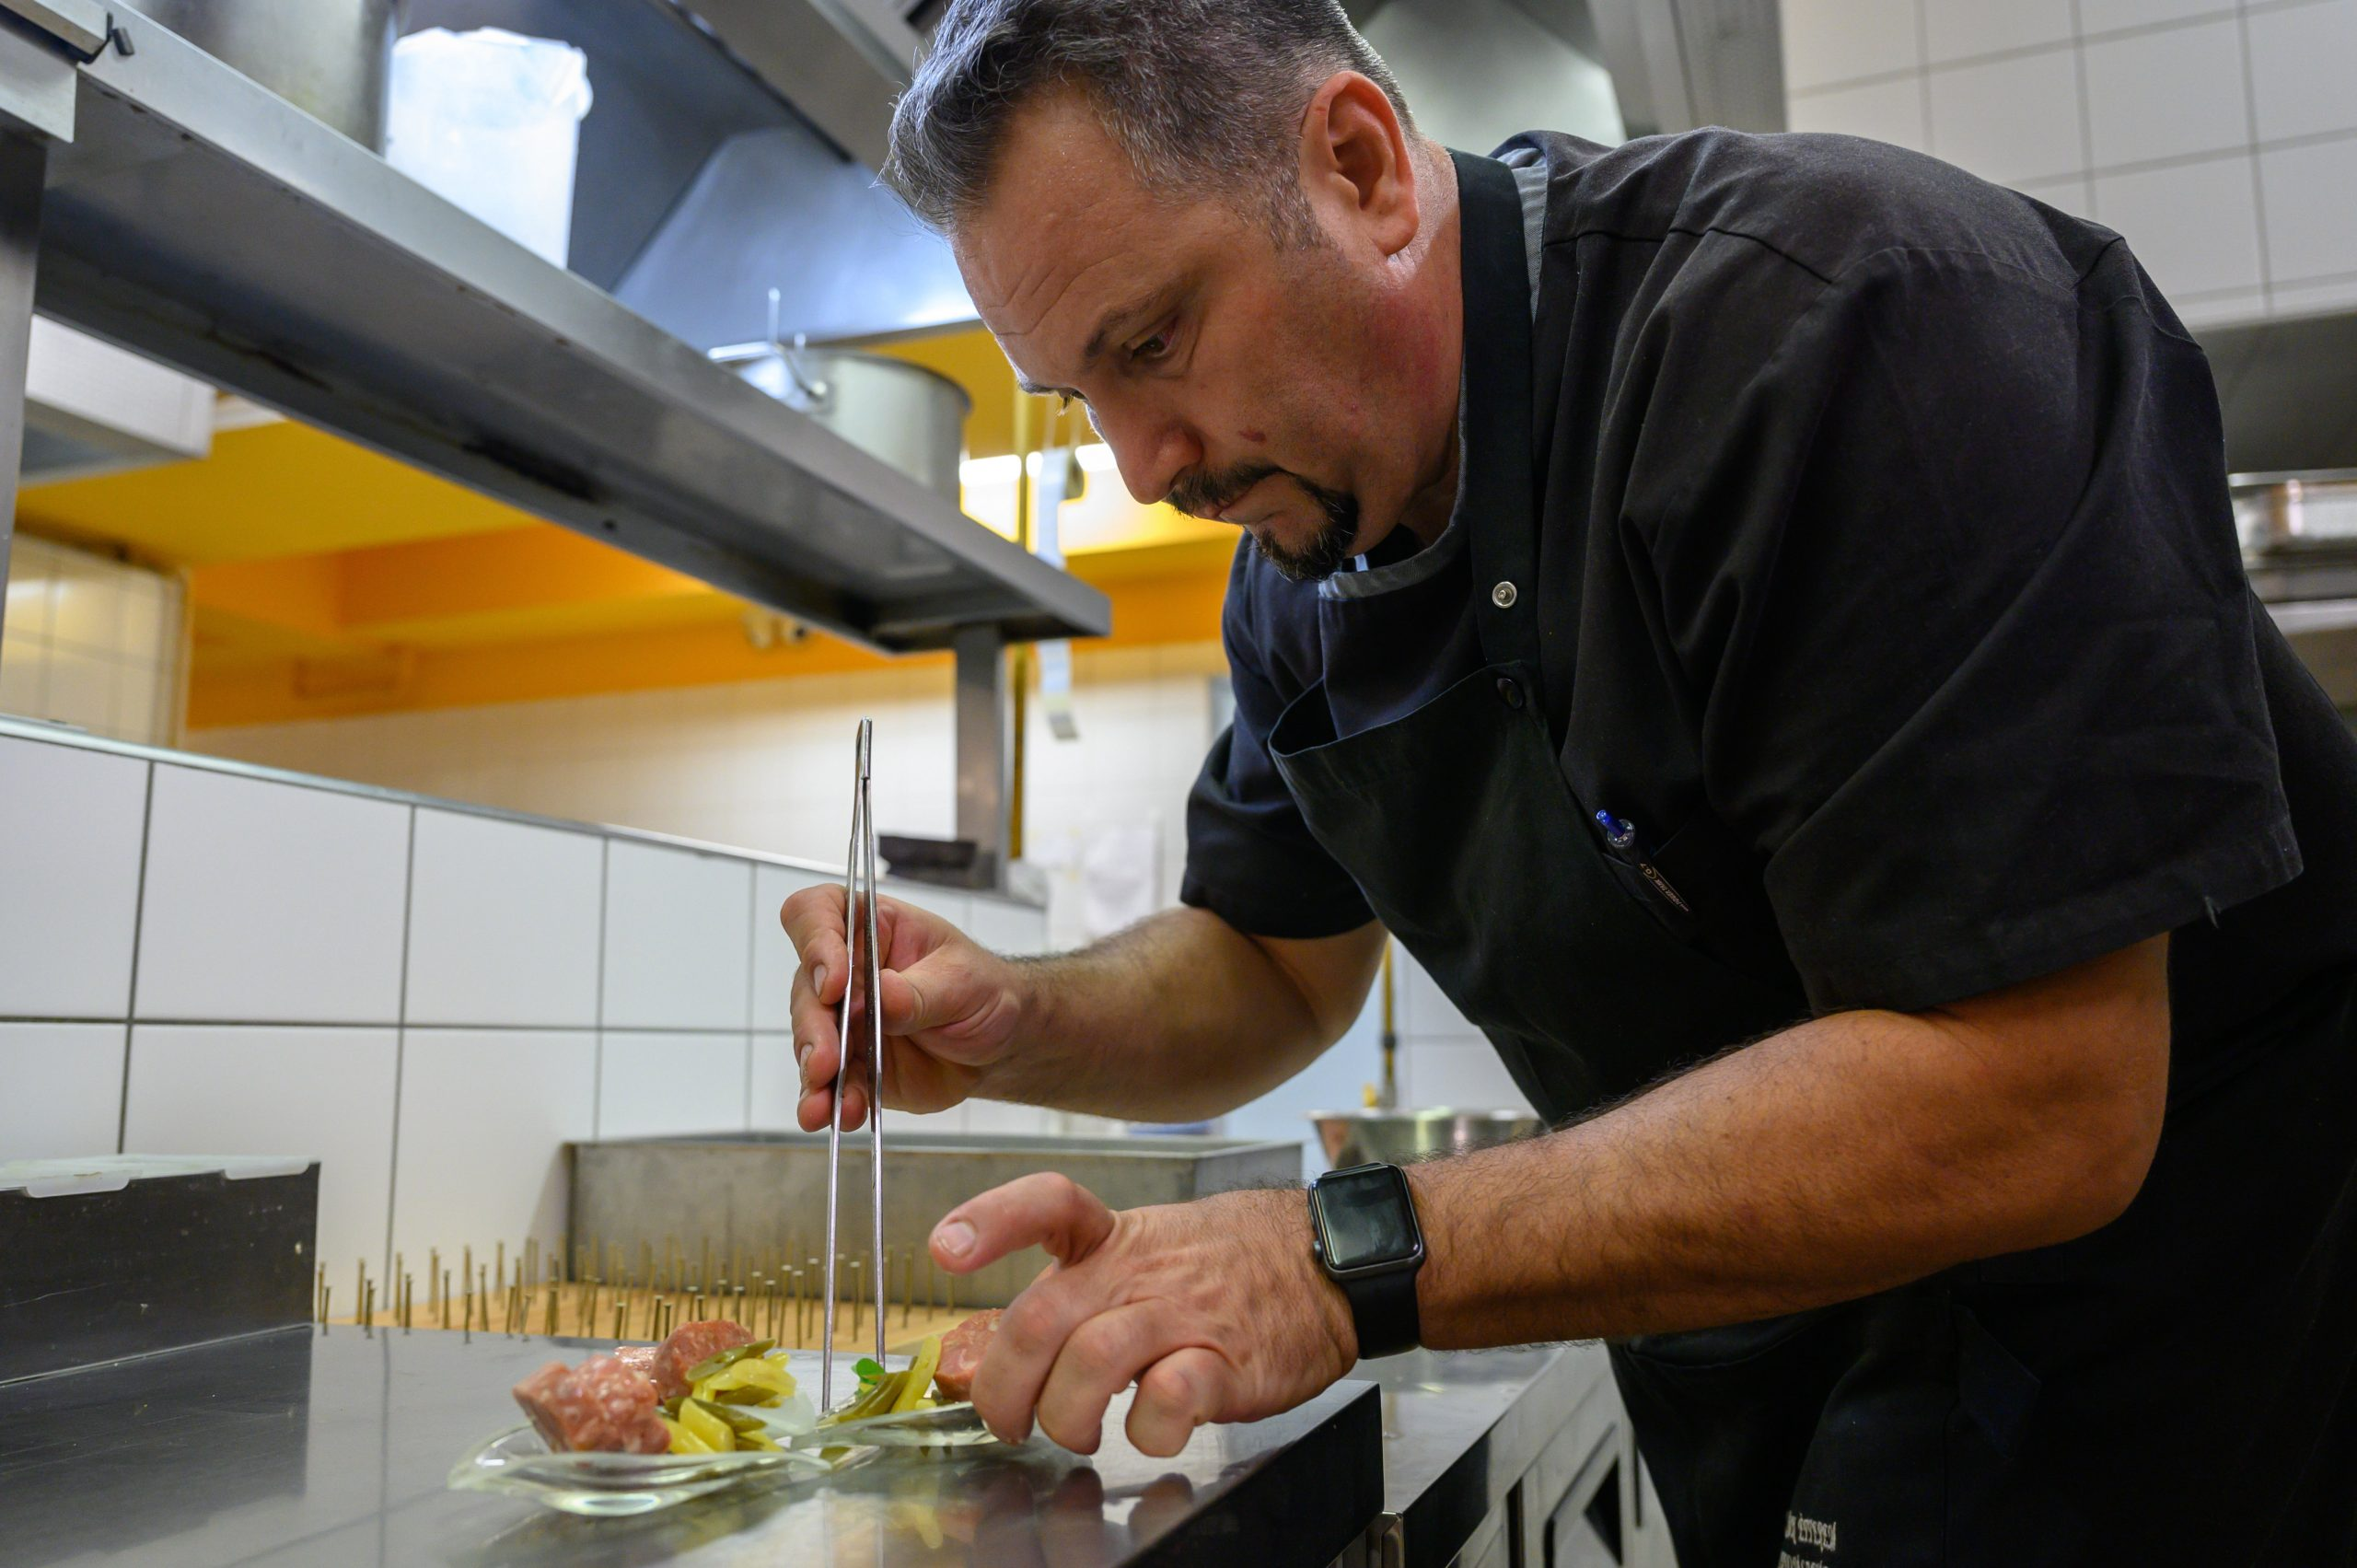 Budapest Restaurants Struggling, Gastronomy of Lake Balaton Soaring